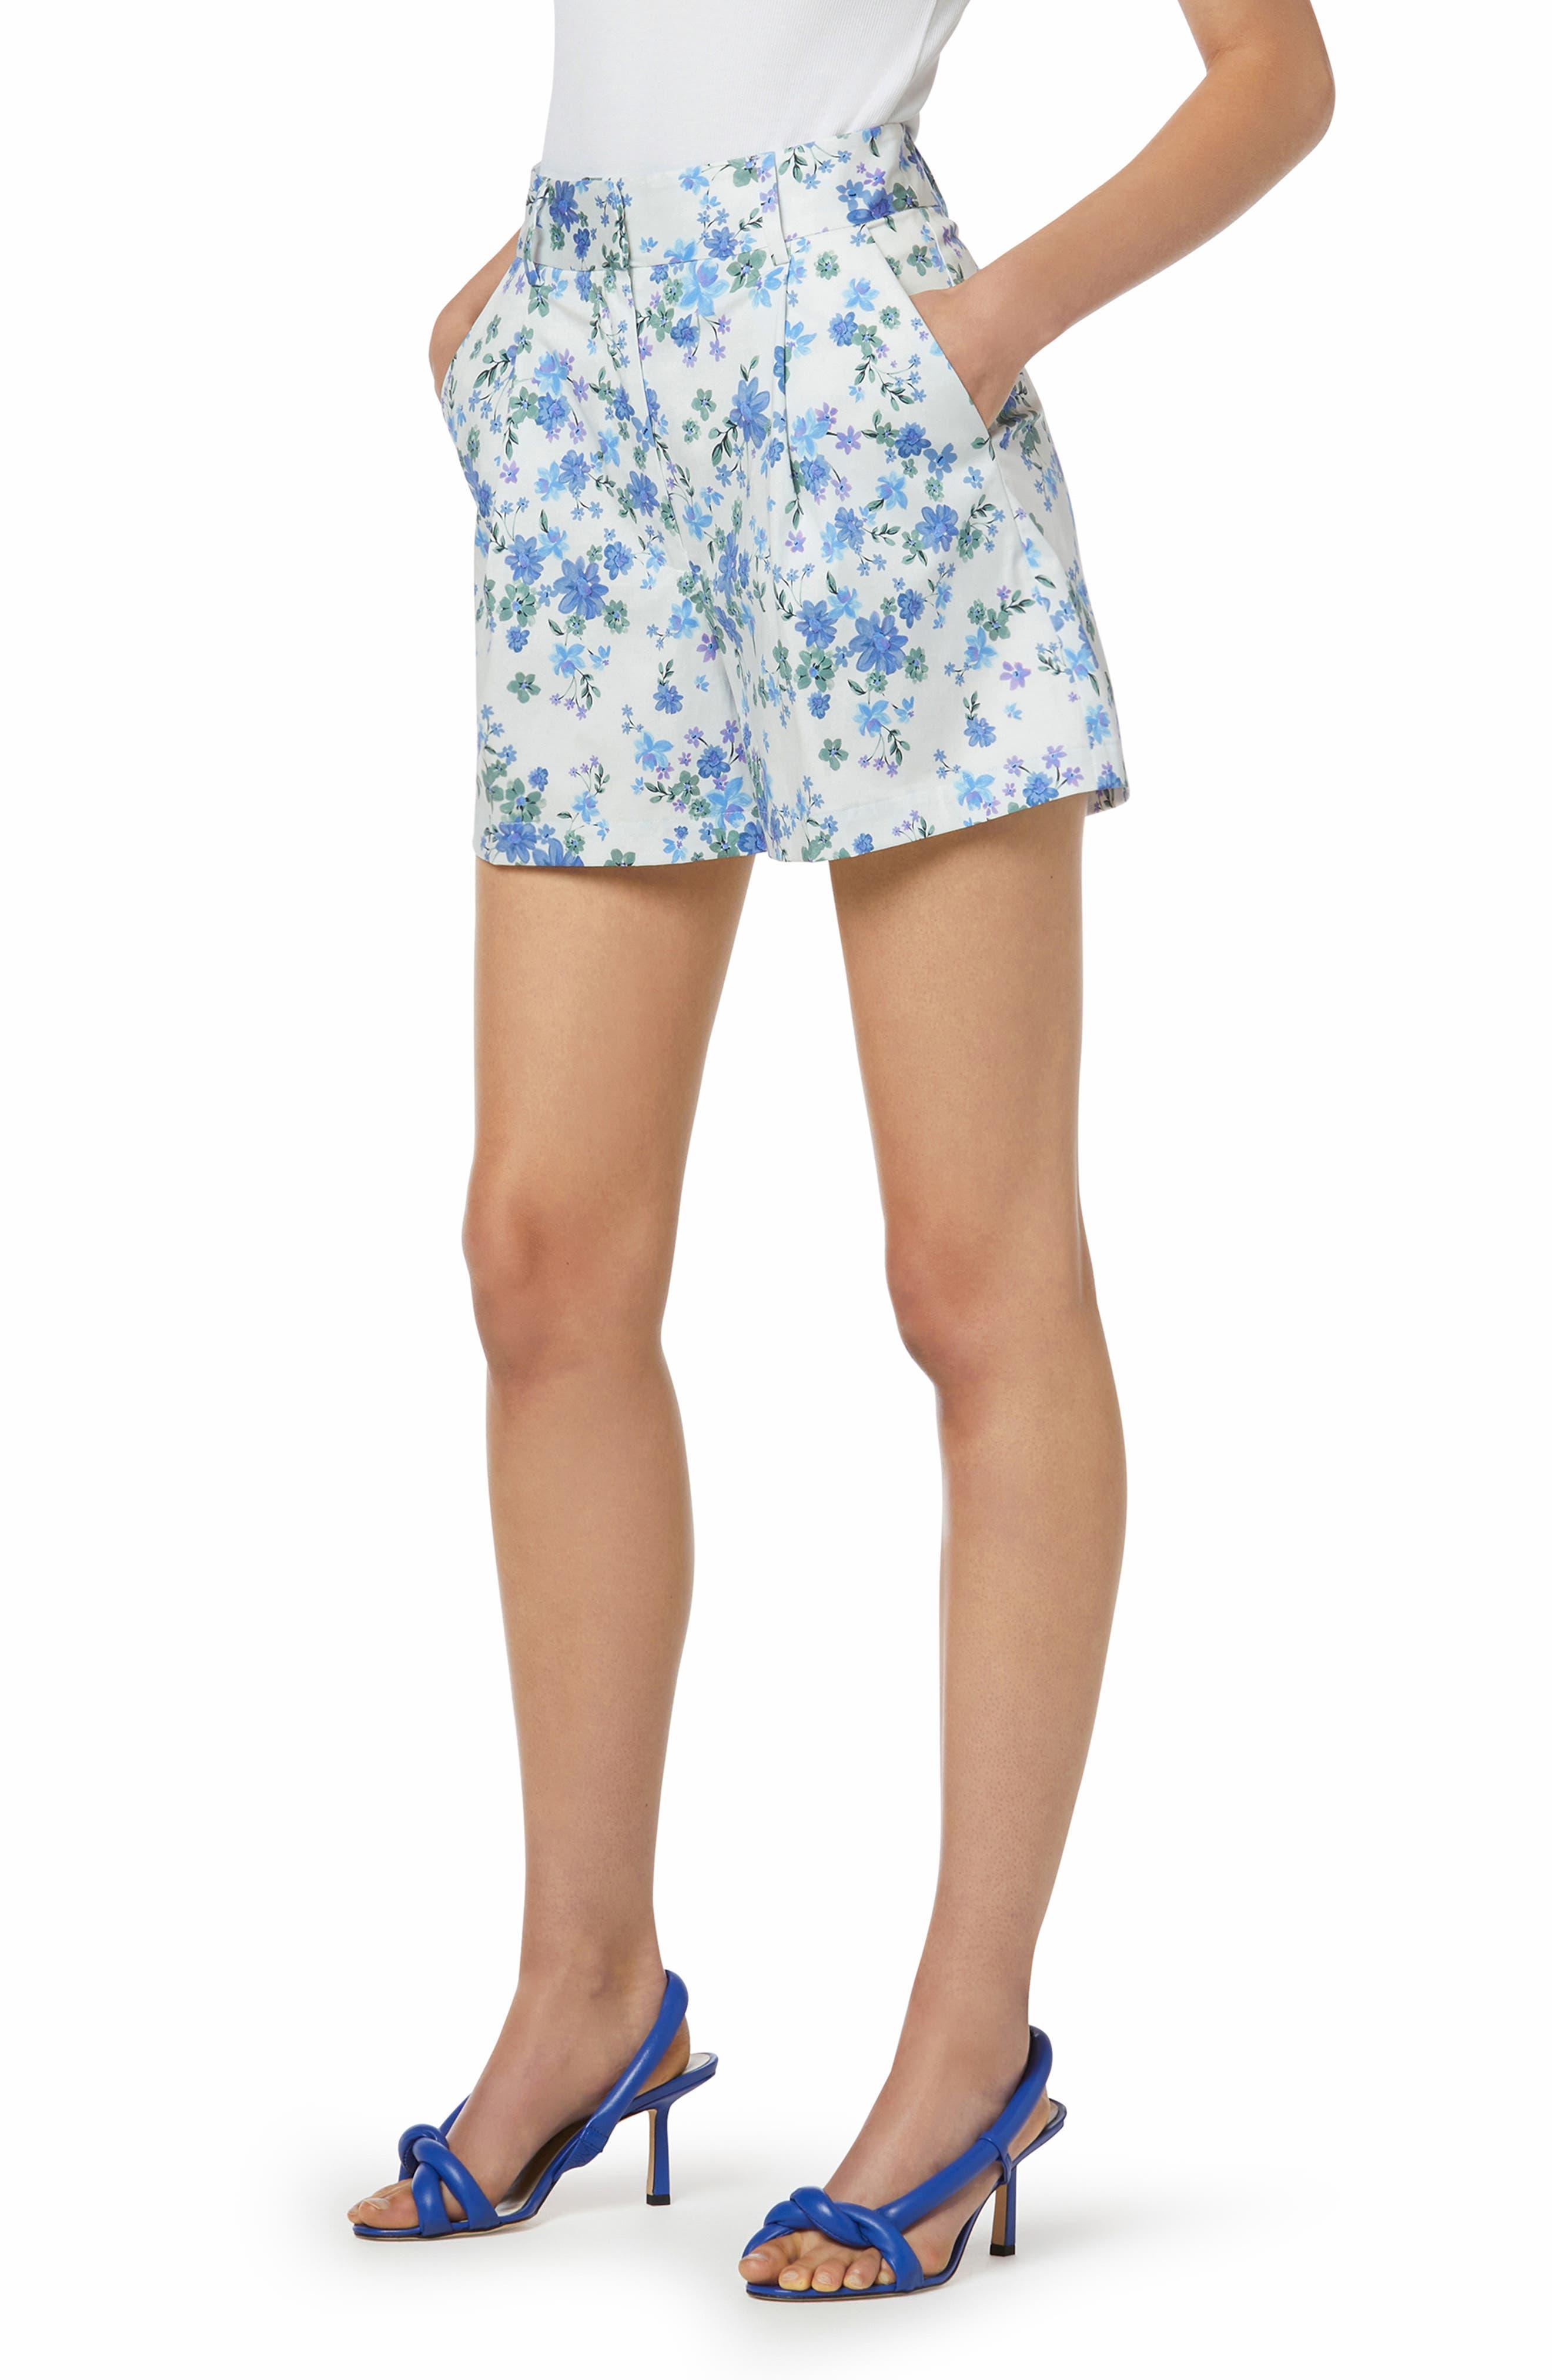 The Lemon Tree Floral Stretch Cotton Shorts